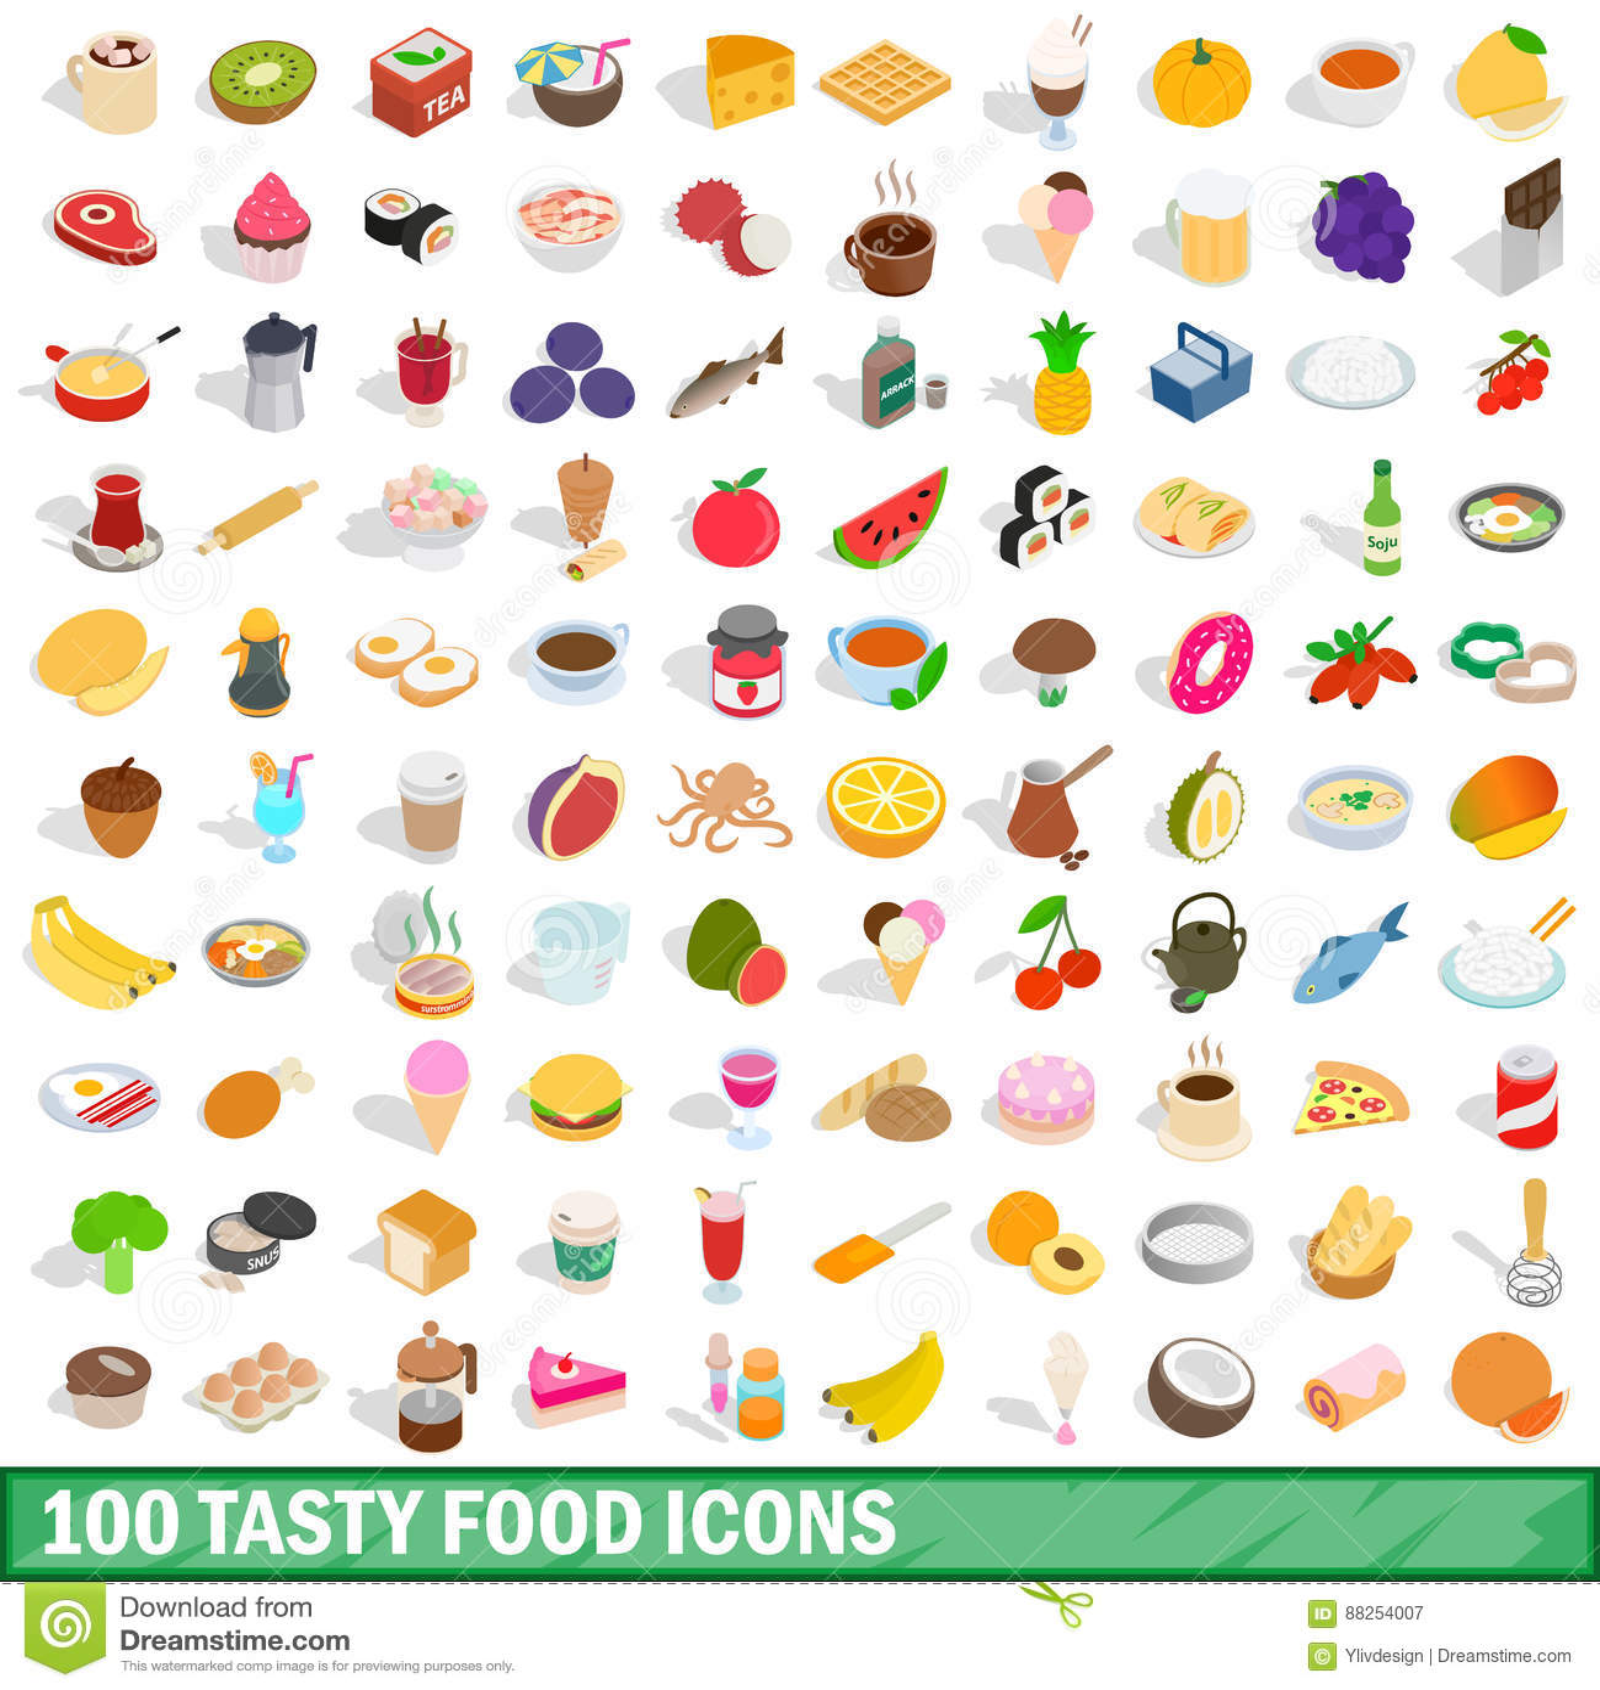 100 tasty food icons set, isometric 3d style